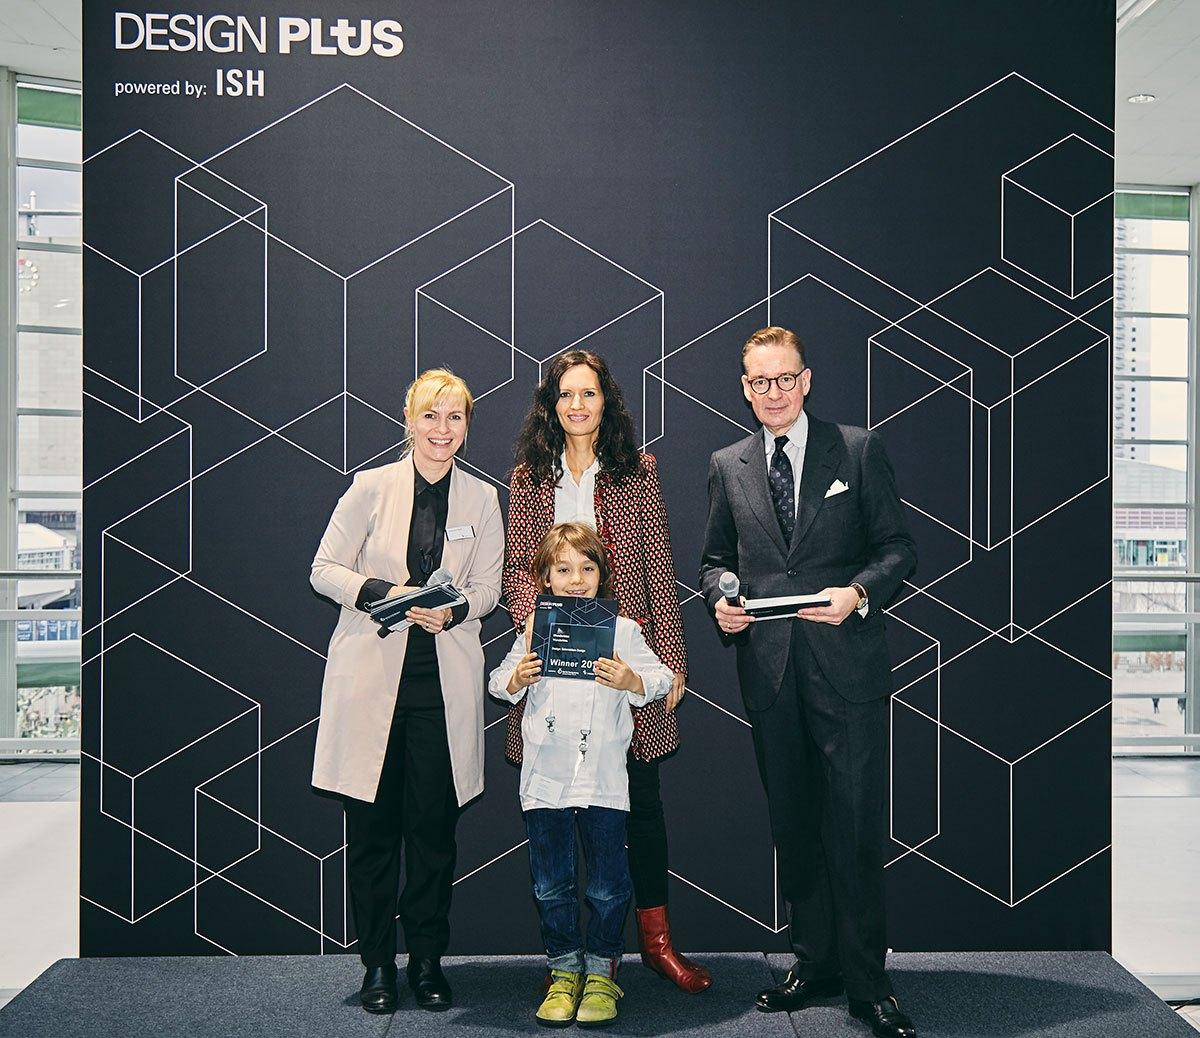 DesignPlusFoto.Wunderblau